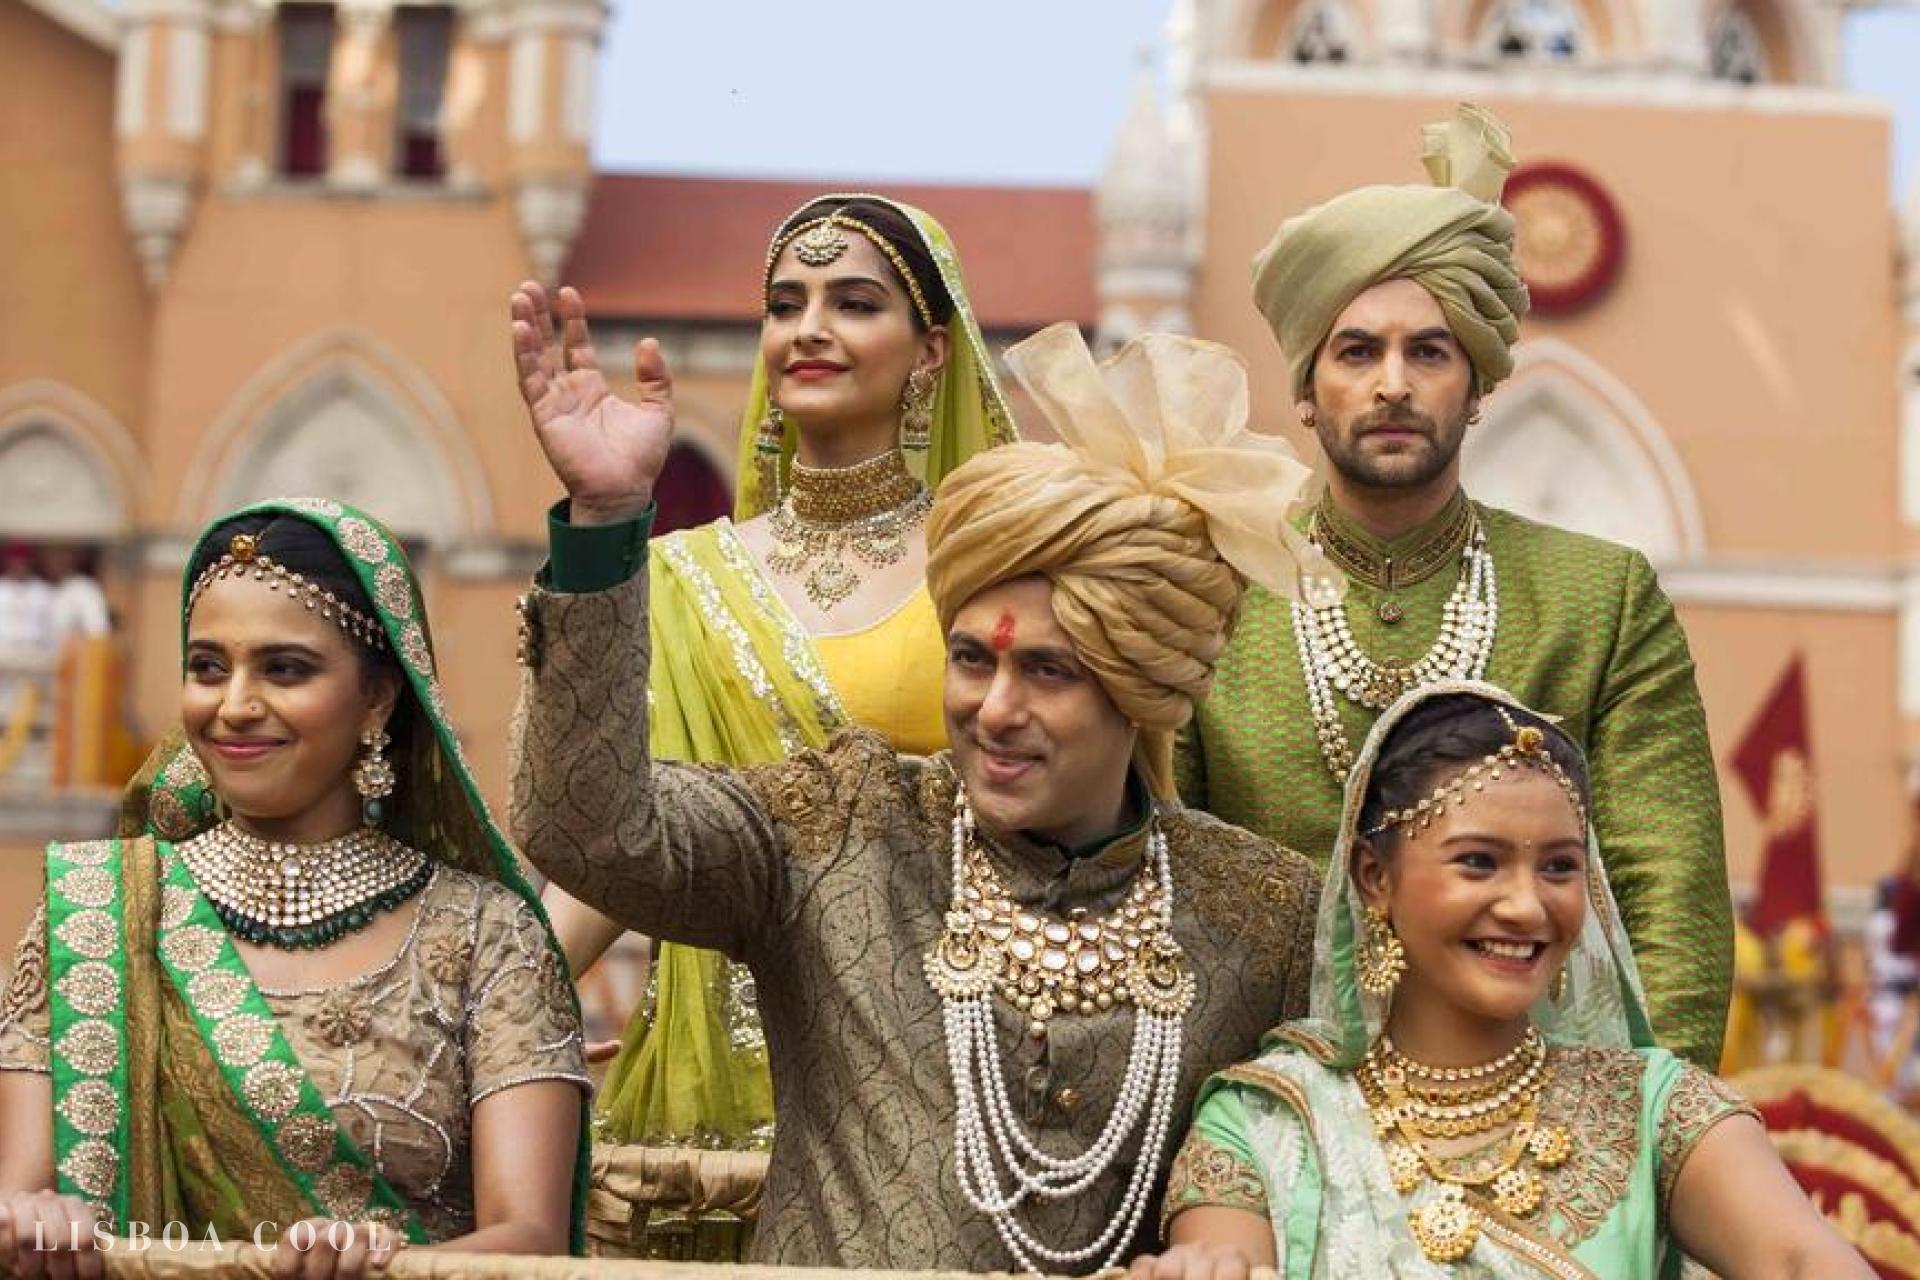 LisboaCool_Blog_Filmes de Bollywood no Museu do Oriente